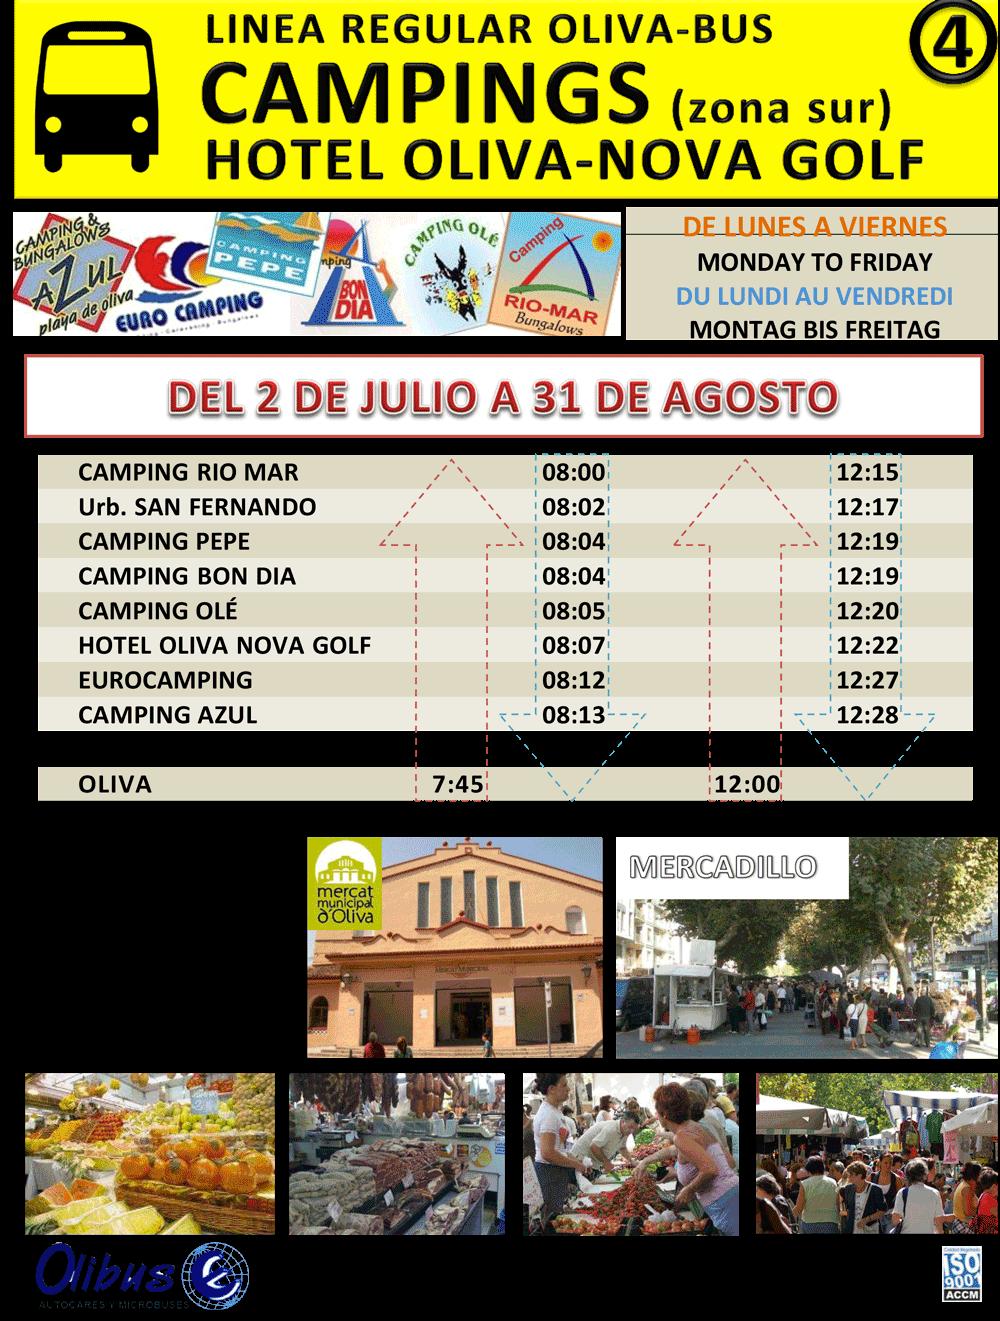 HORARIO DE ESTIU - CAMPINGS